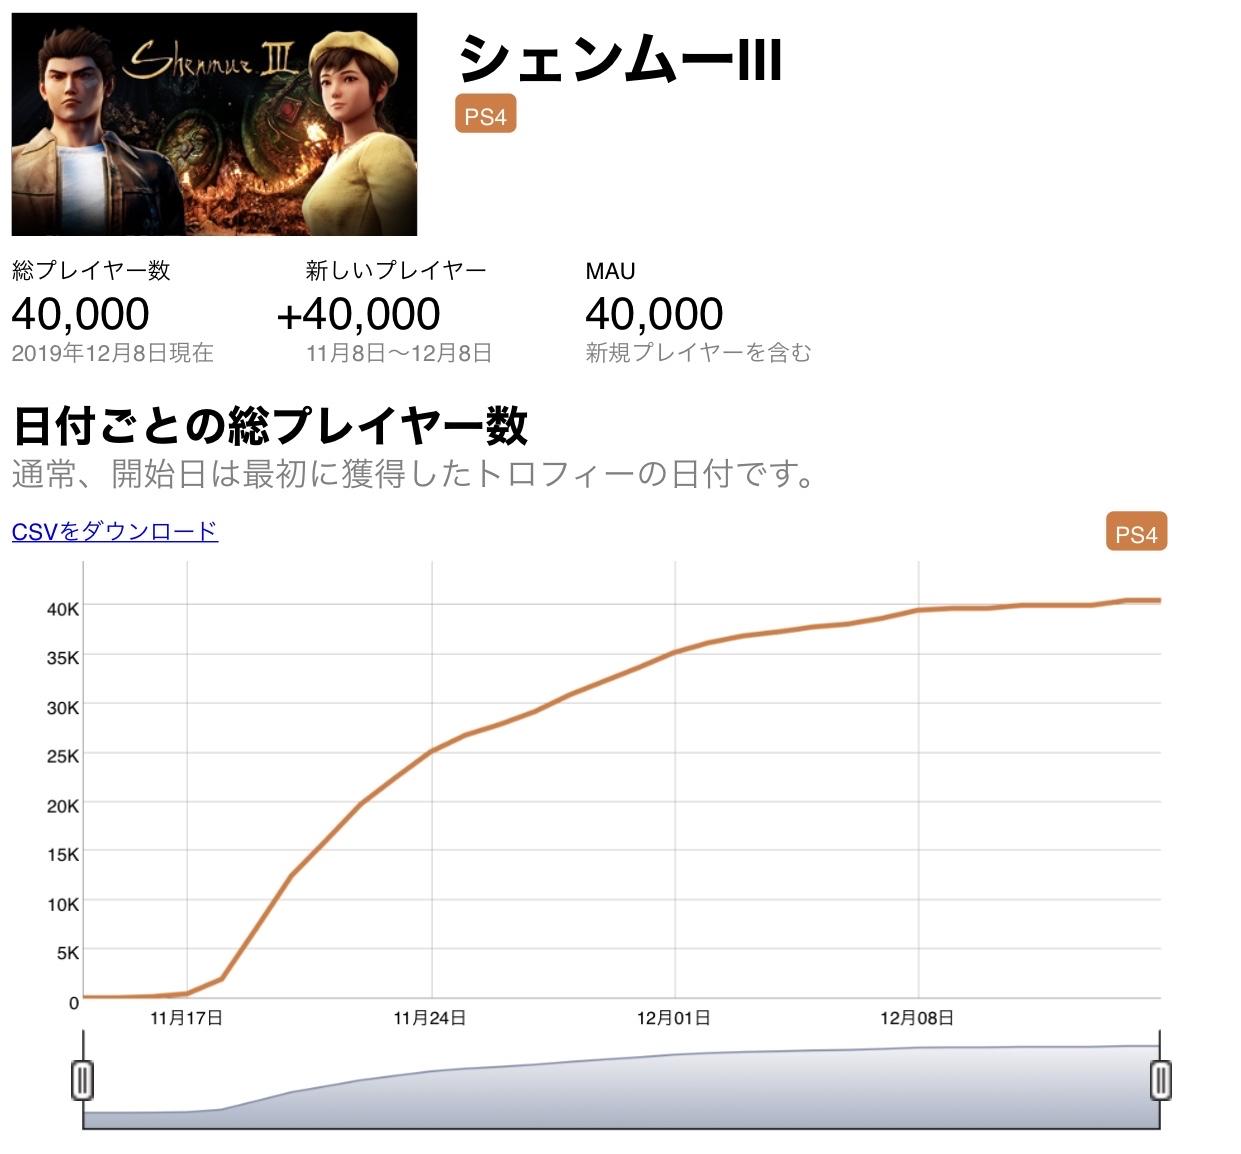 QDvHFtW - 【悲報】シェンムー3、プレイヤー数たった4万人